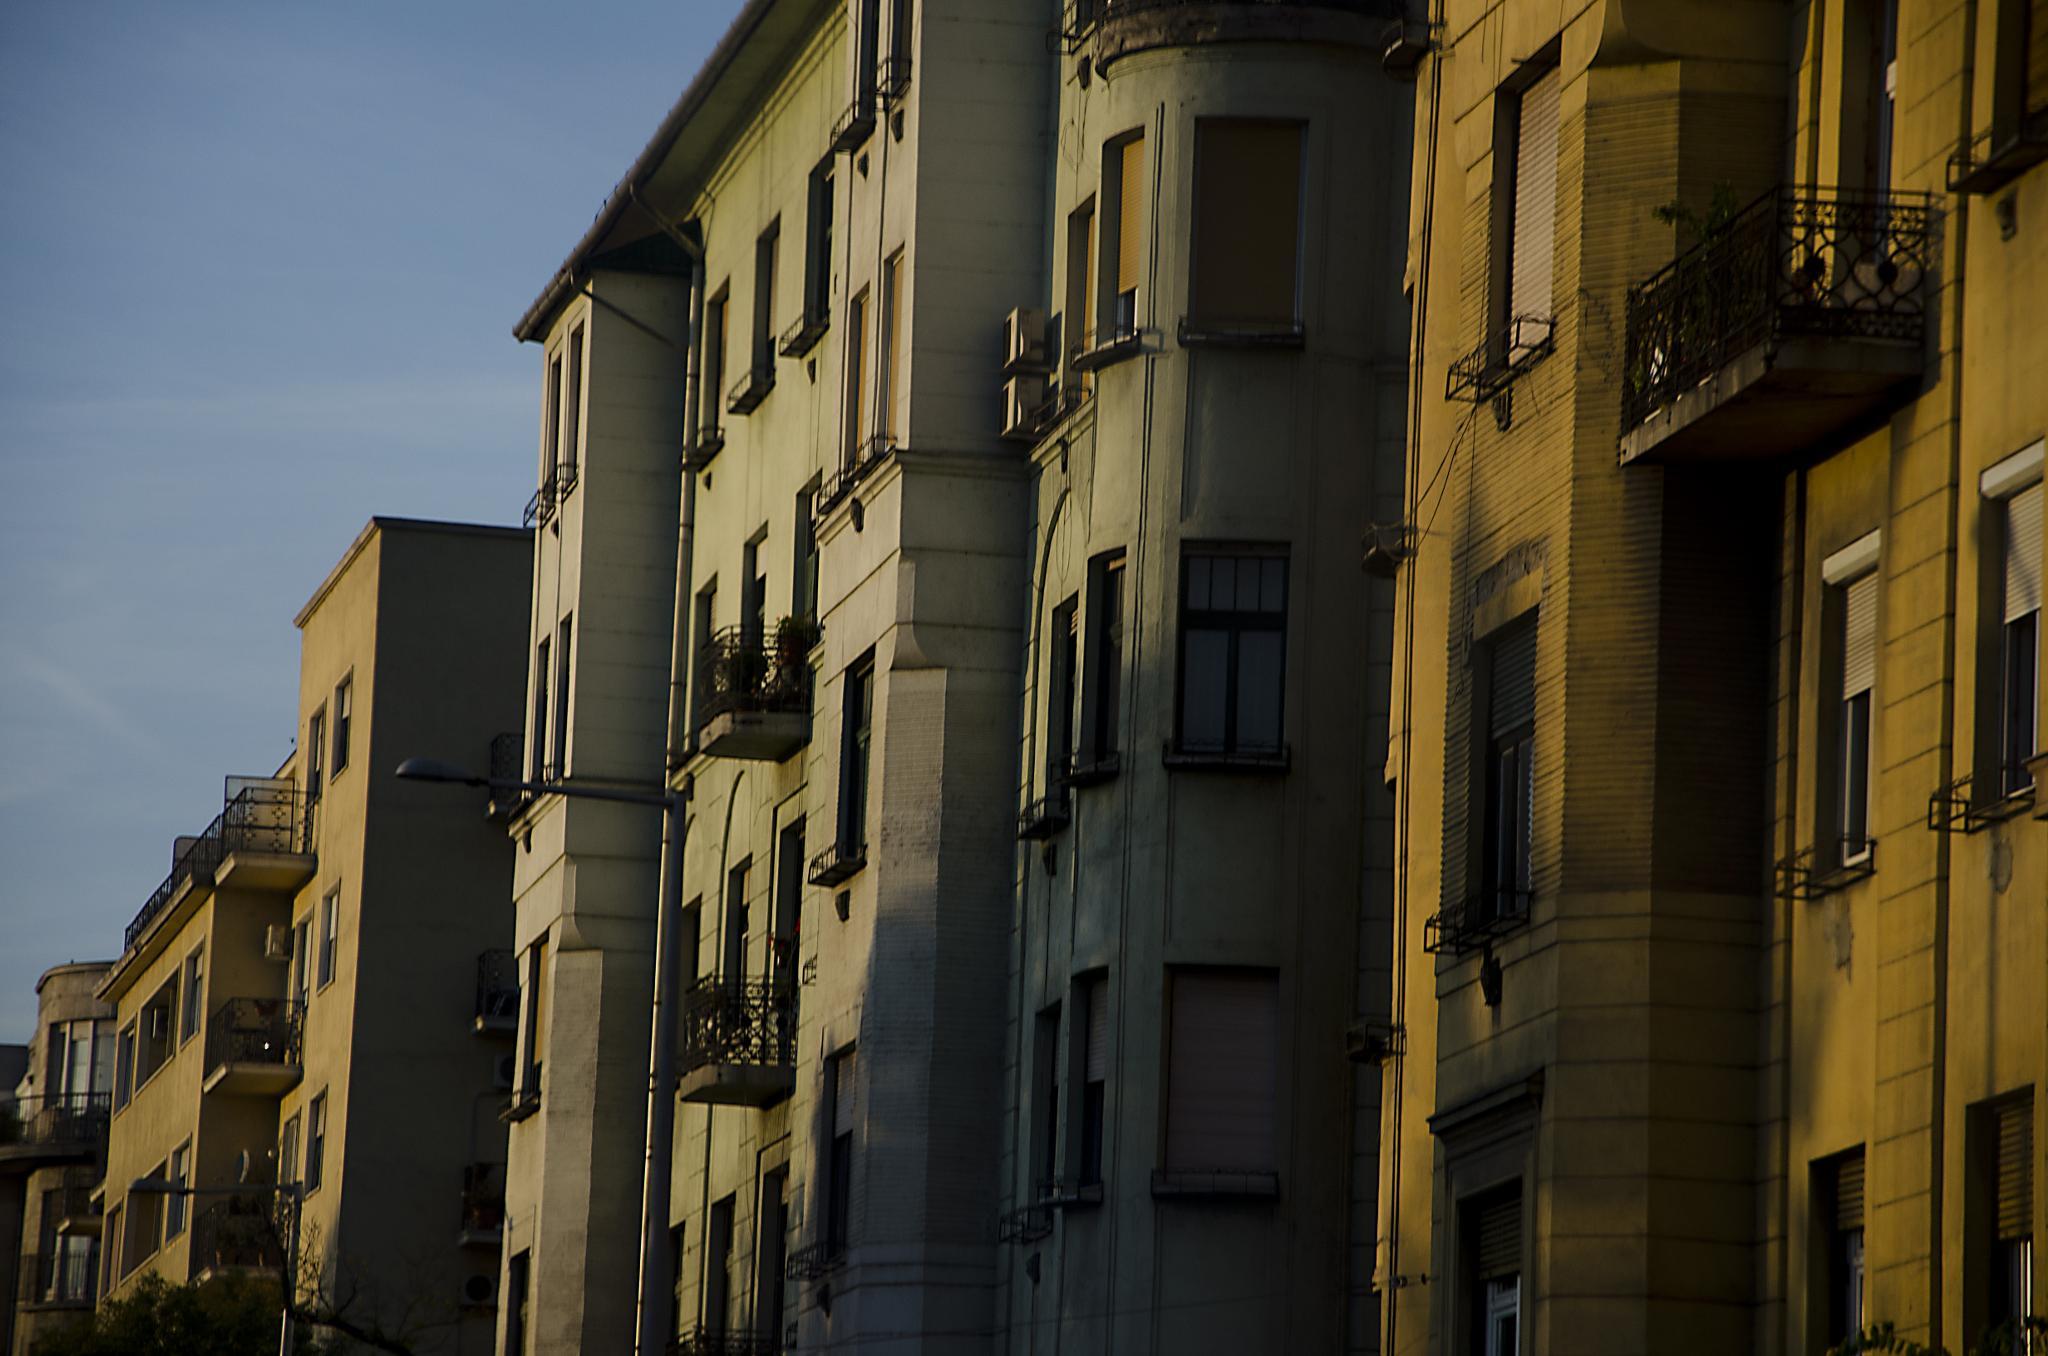 Újlipótváros, neighborhood in the 13th district of Budapest by ZSM